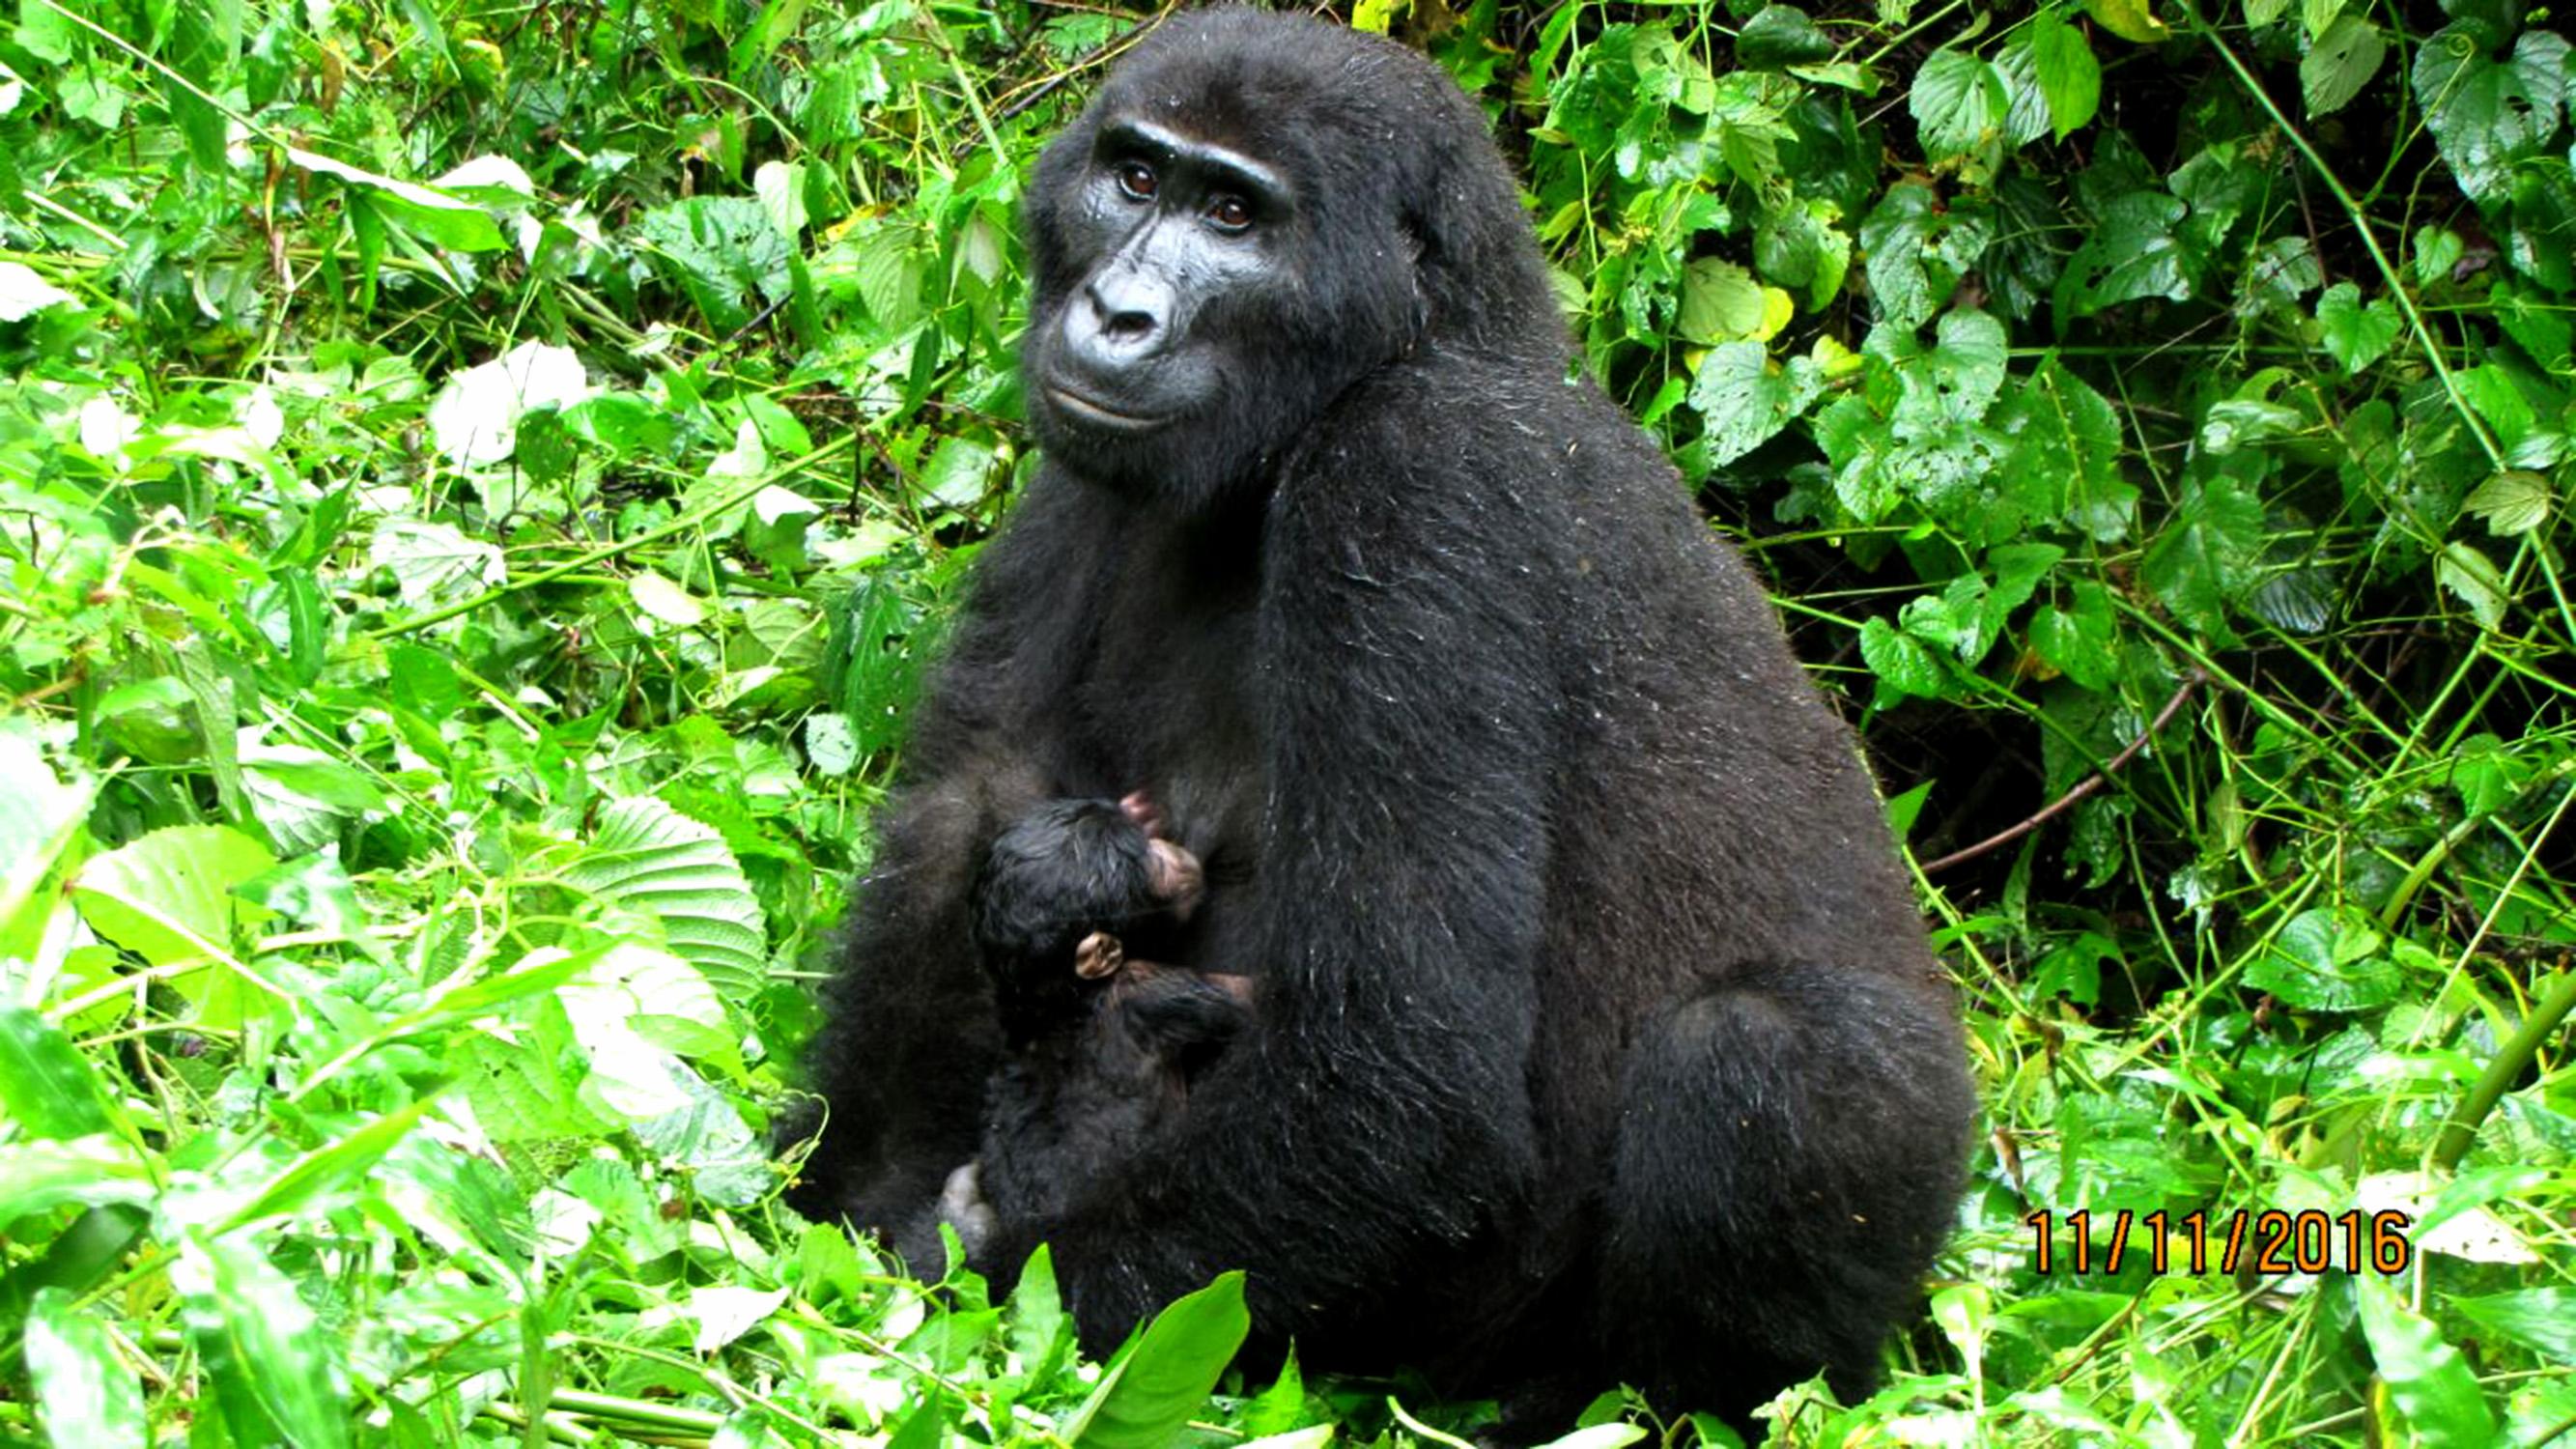 baby-gorilla-born-2016-11-11-at-bwindi-national-park02